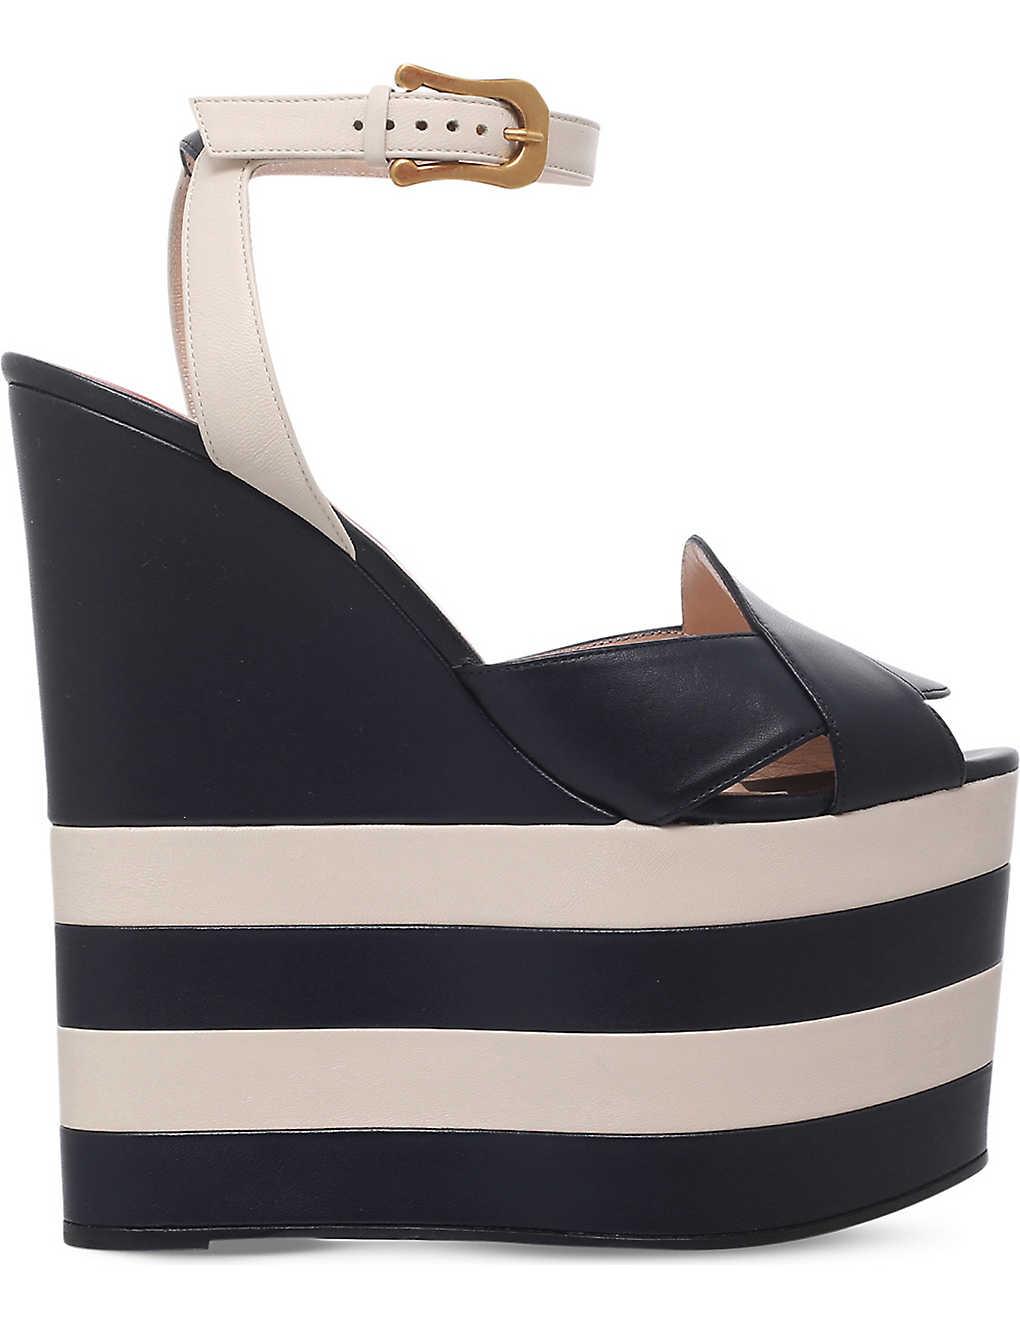 fc1471a327 GUCCI - Sally leather platform wedge sandals | Selfridges.com